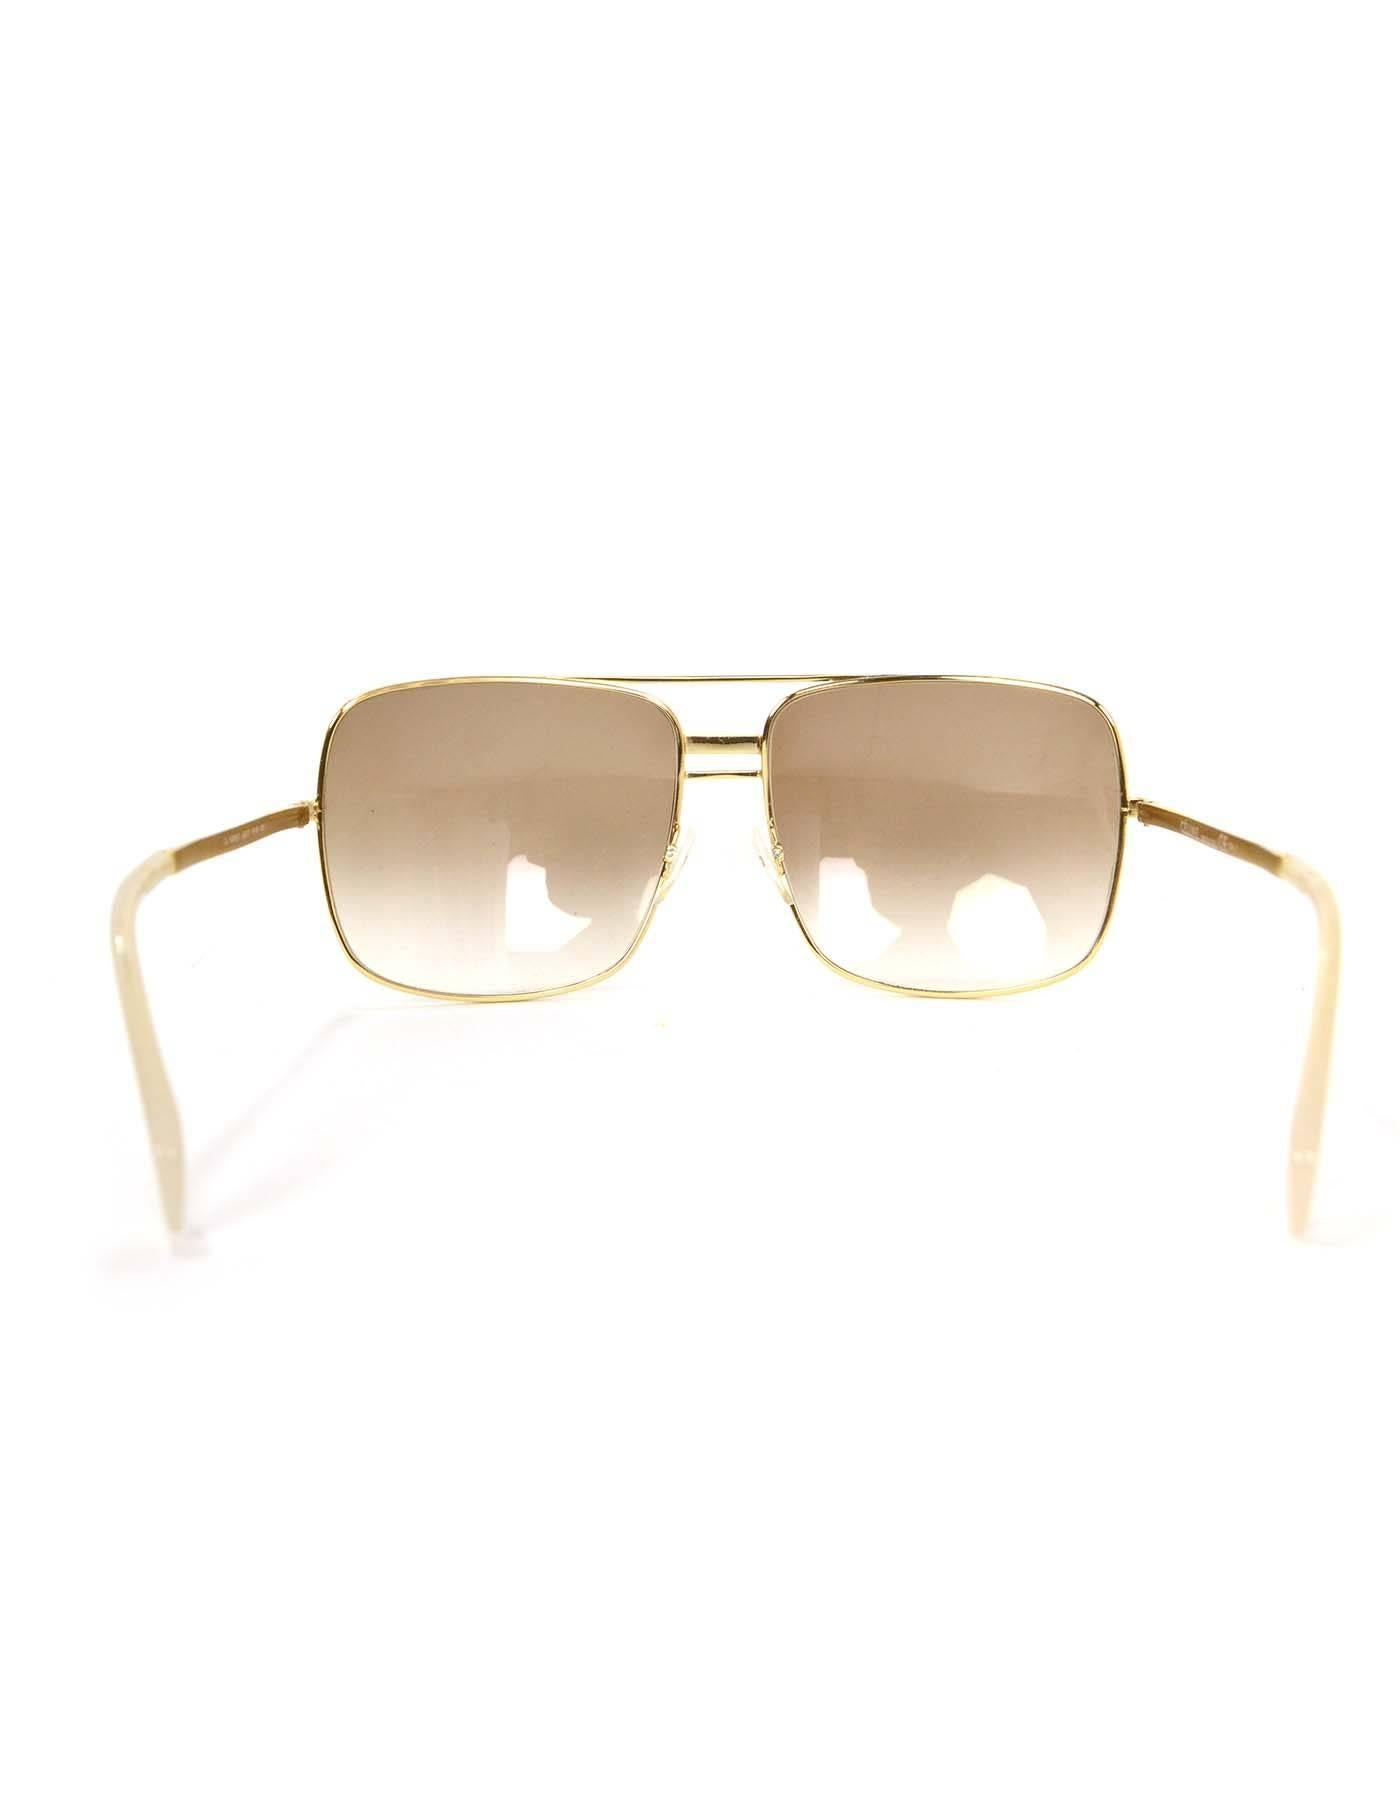 2e6b108568 Celine Gold CL41808 S Aviator Sunglasses For Sale at 1stdibs